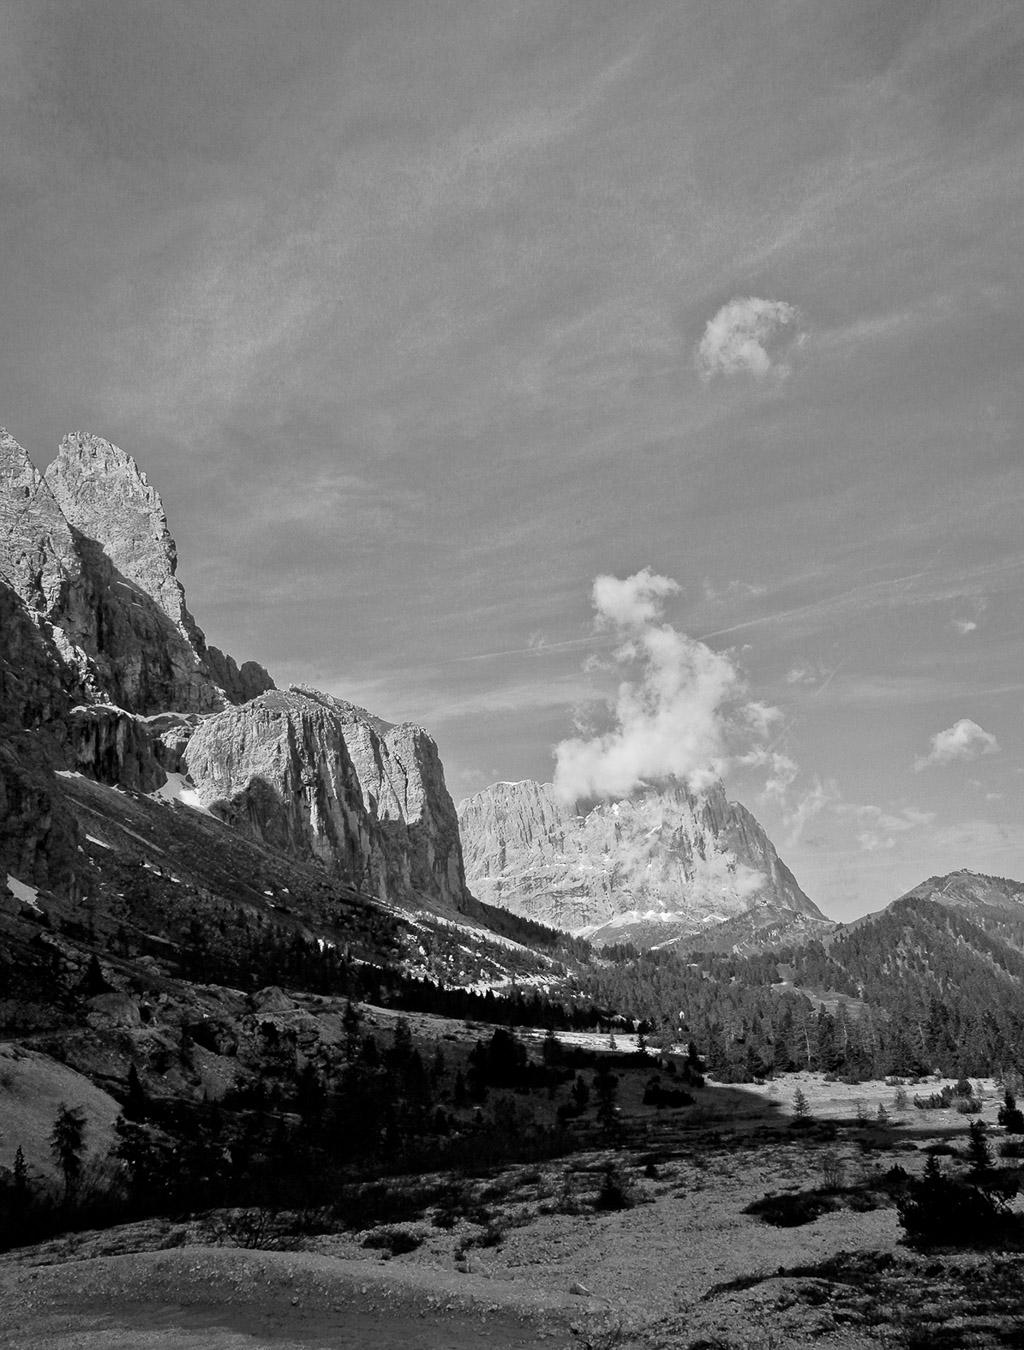 Dolomites, Italy 2012